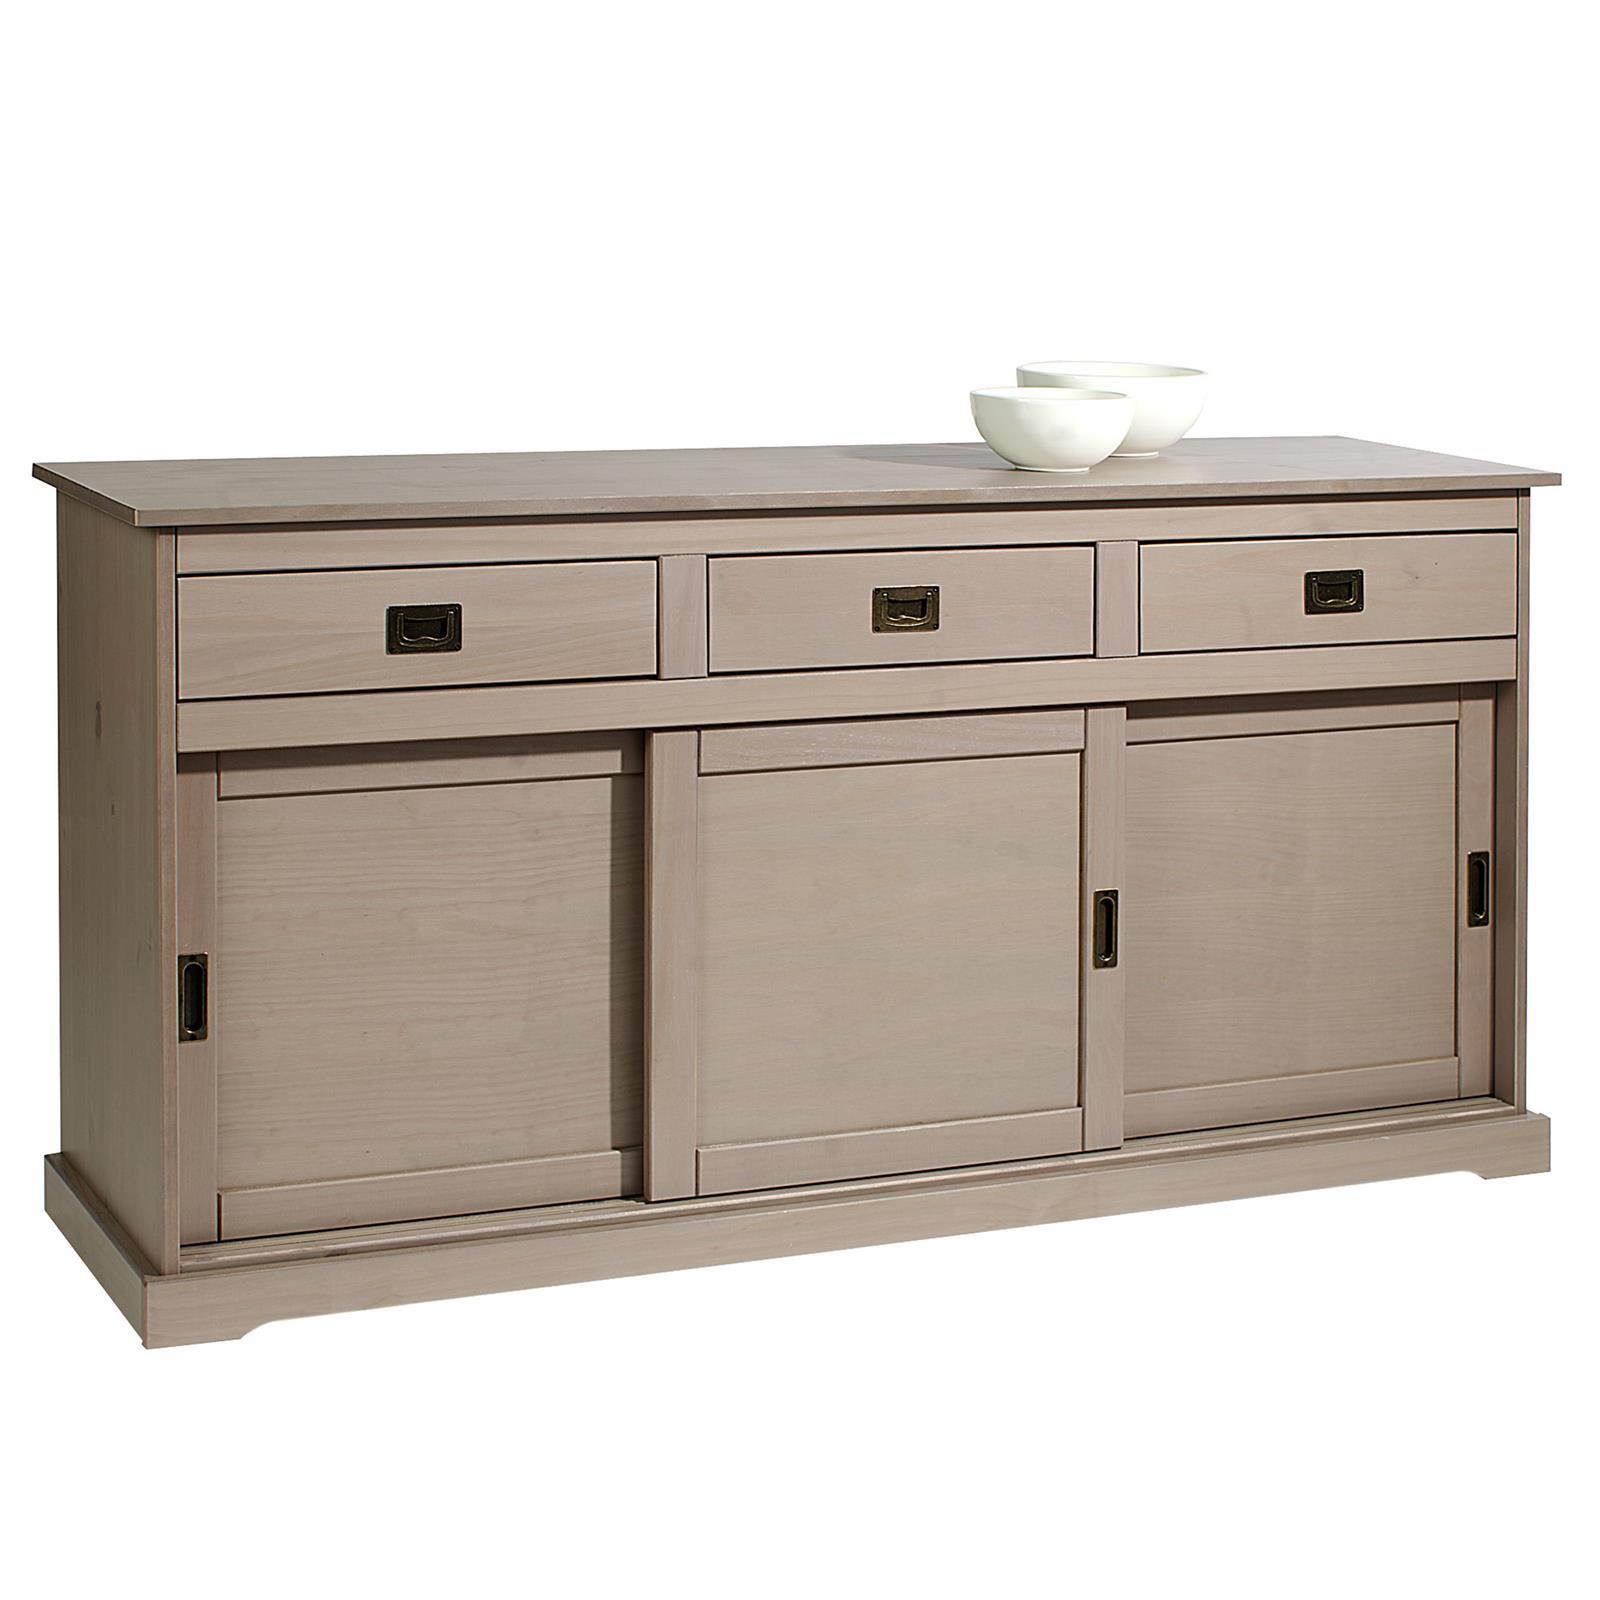 buffet savona en pin massif 3 tiroirs et 3 portes lasur. Black Bedroom Furniture Sets. Home Design Ideas